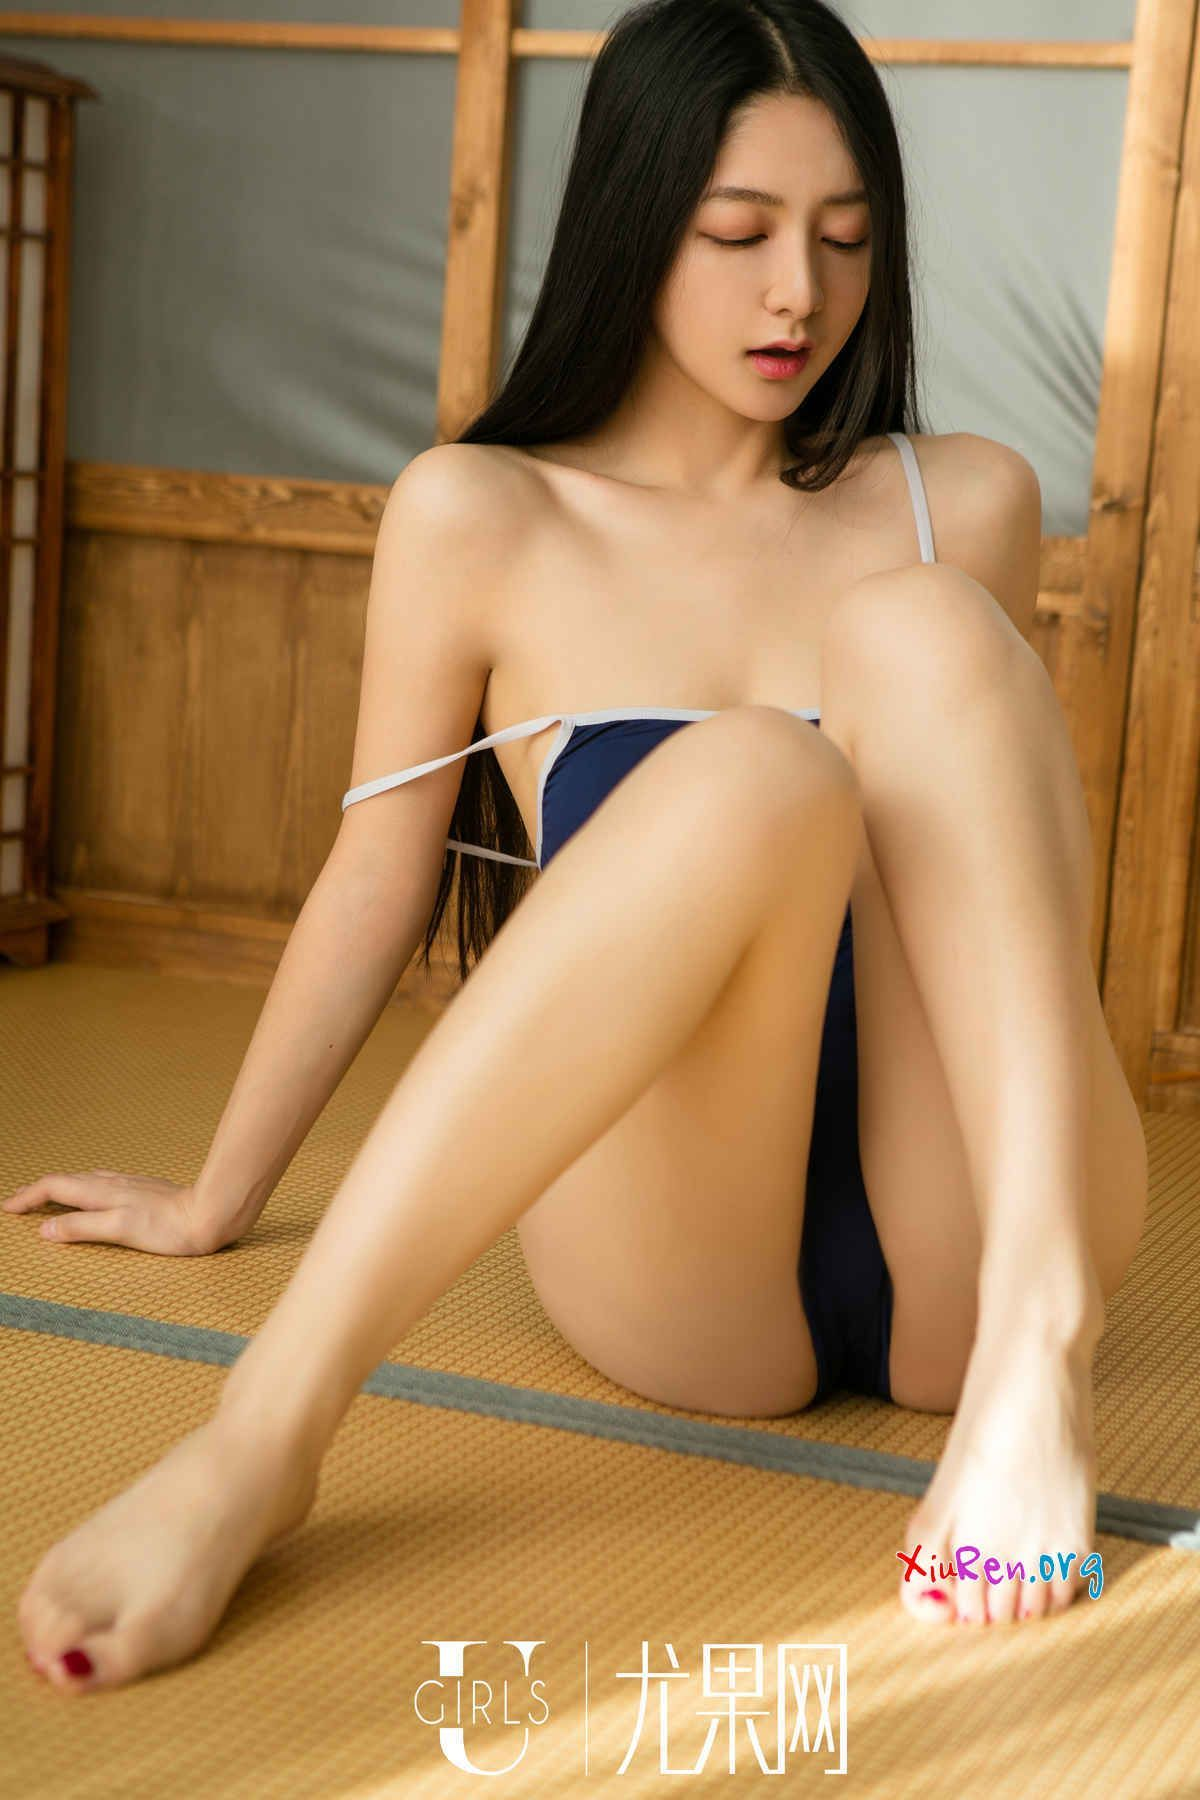 Asian Girls Porn Pics most beautiful asian porno girl porn fuckbook 2018 - porn tube.